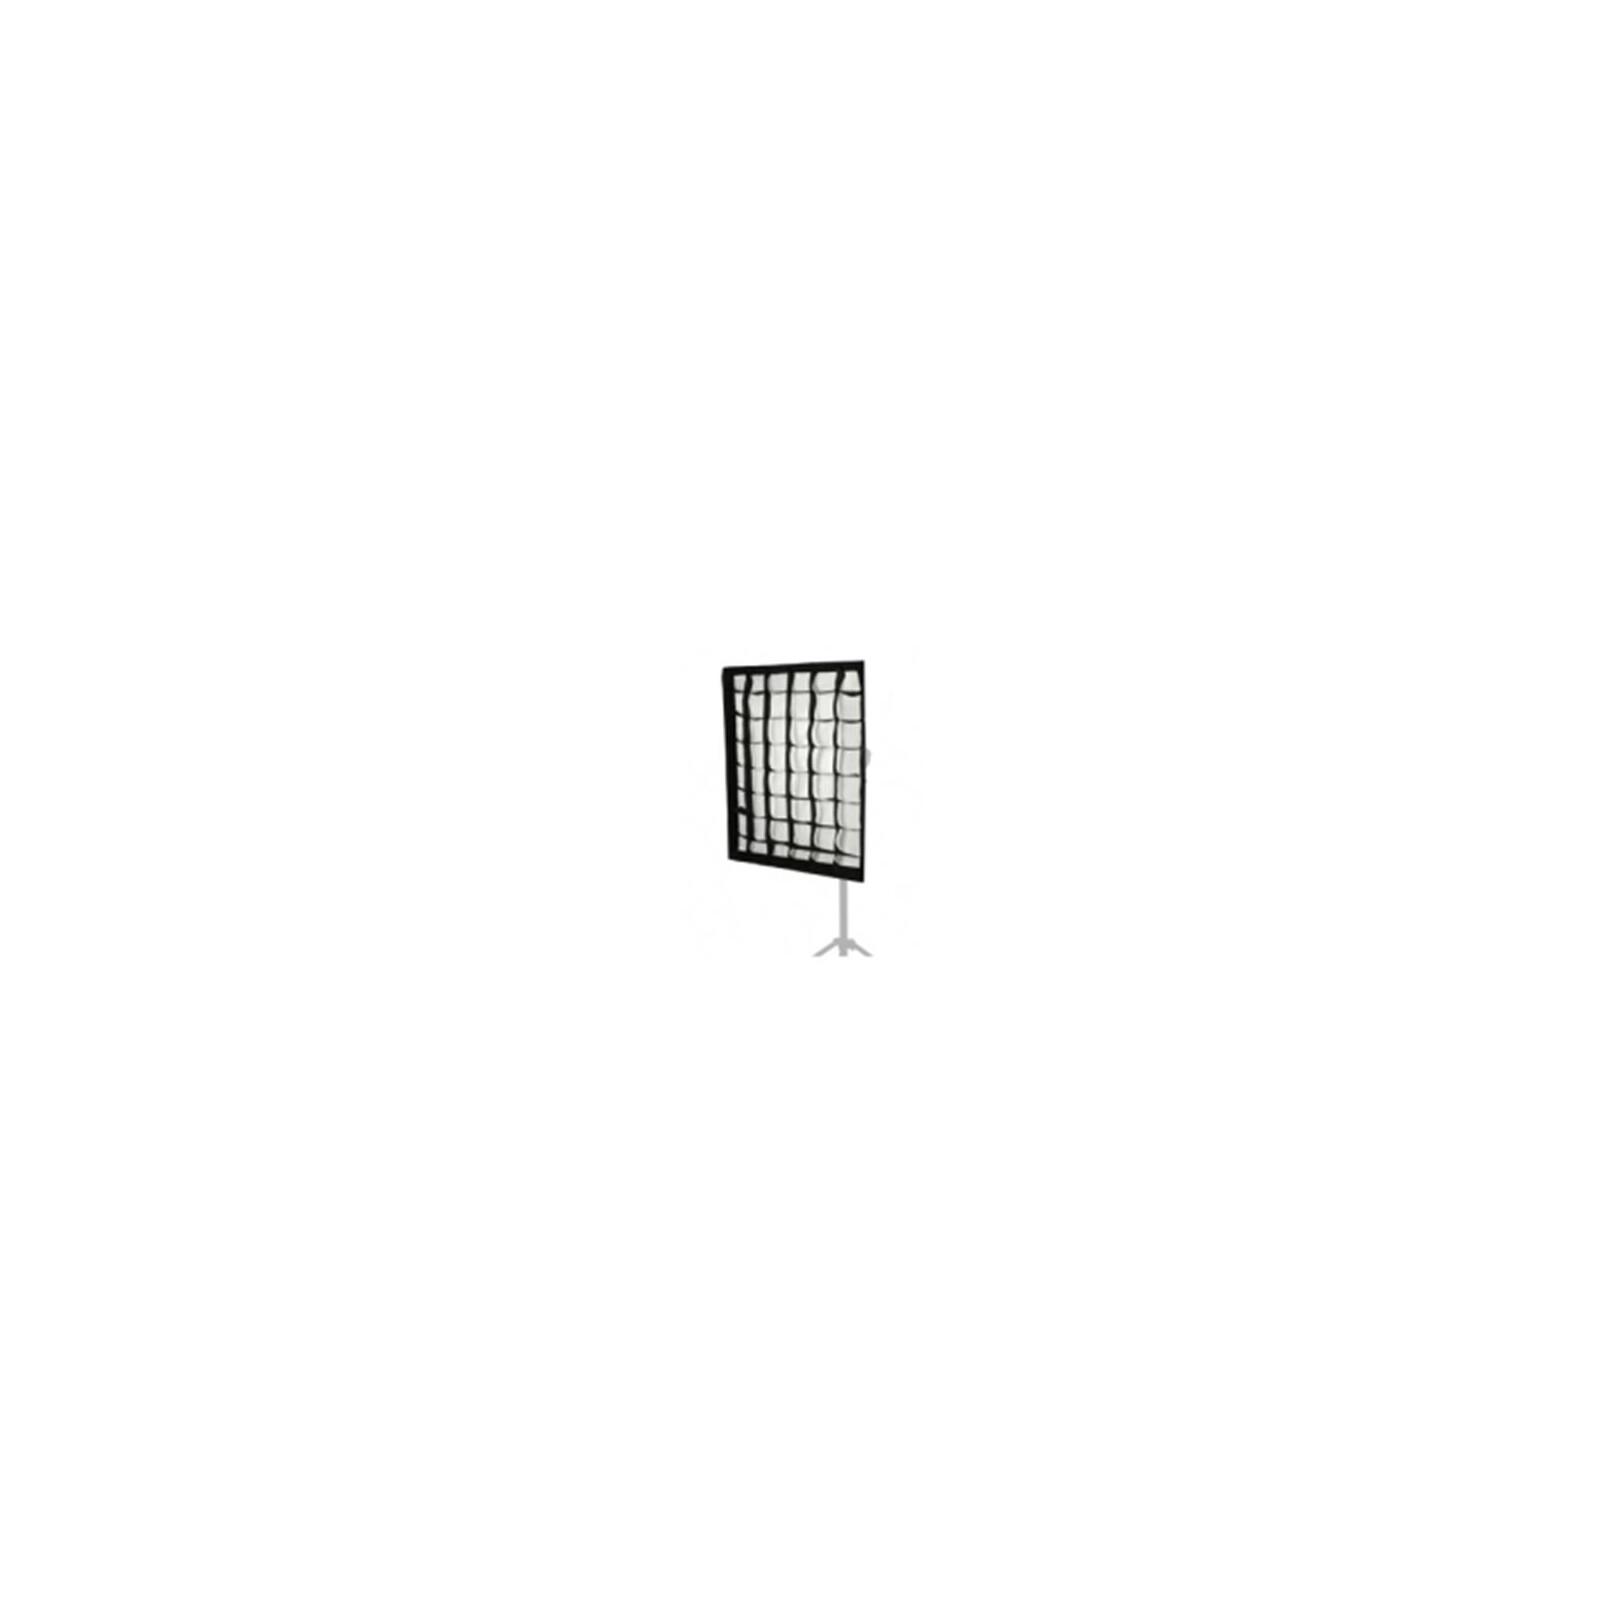 walimex pro Softbox PLUS 60x80cm für Aurora/Bowens